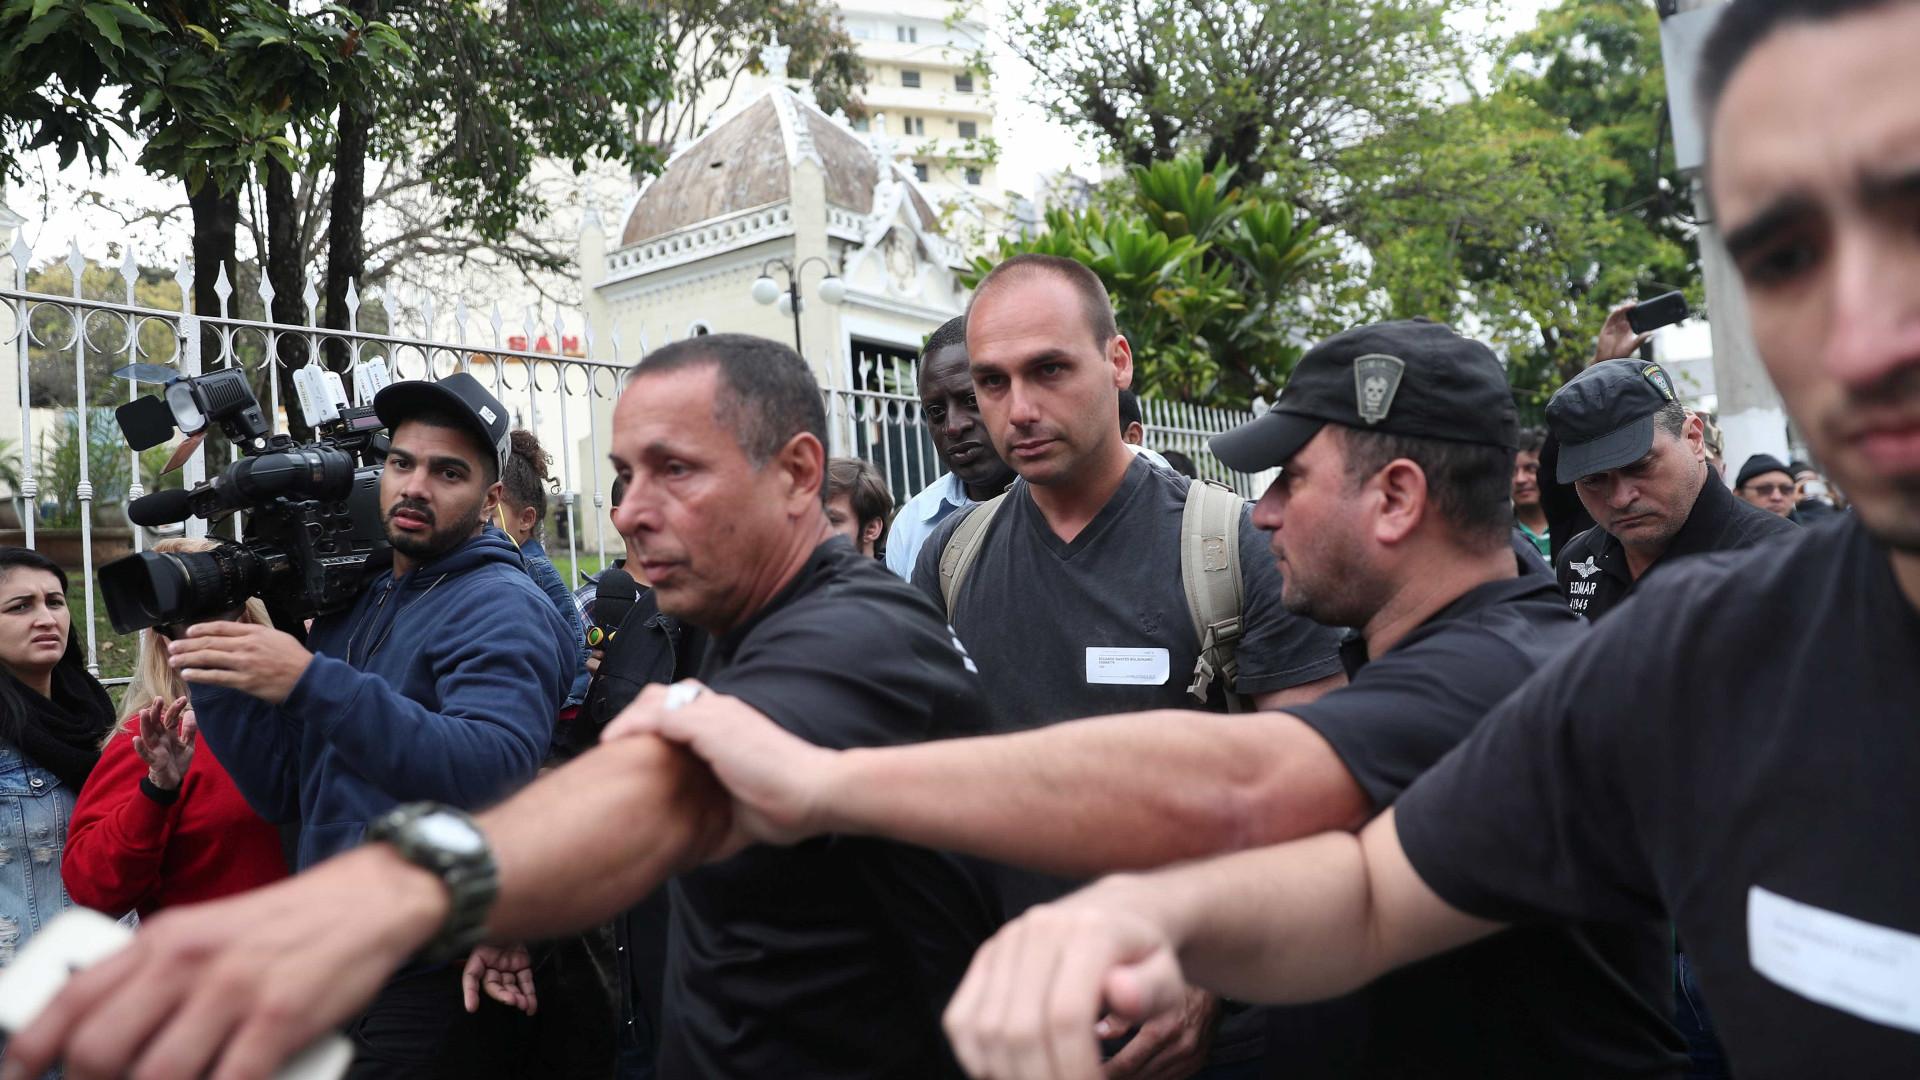 Cúpula Conservadora acaba com pedido de casamento de Eduardo Bolsonaro